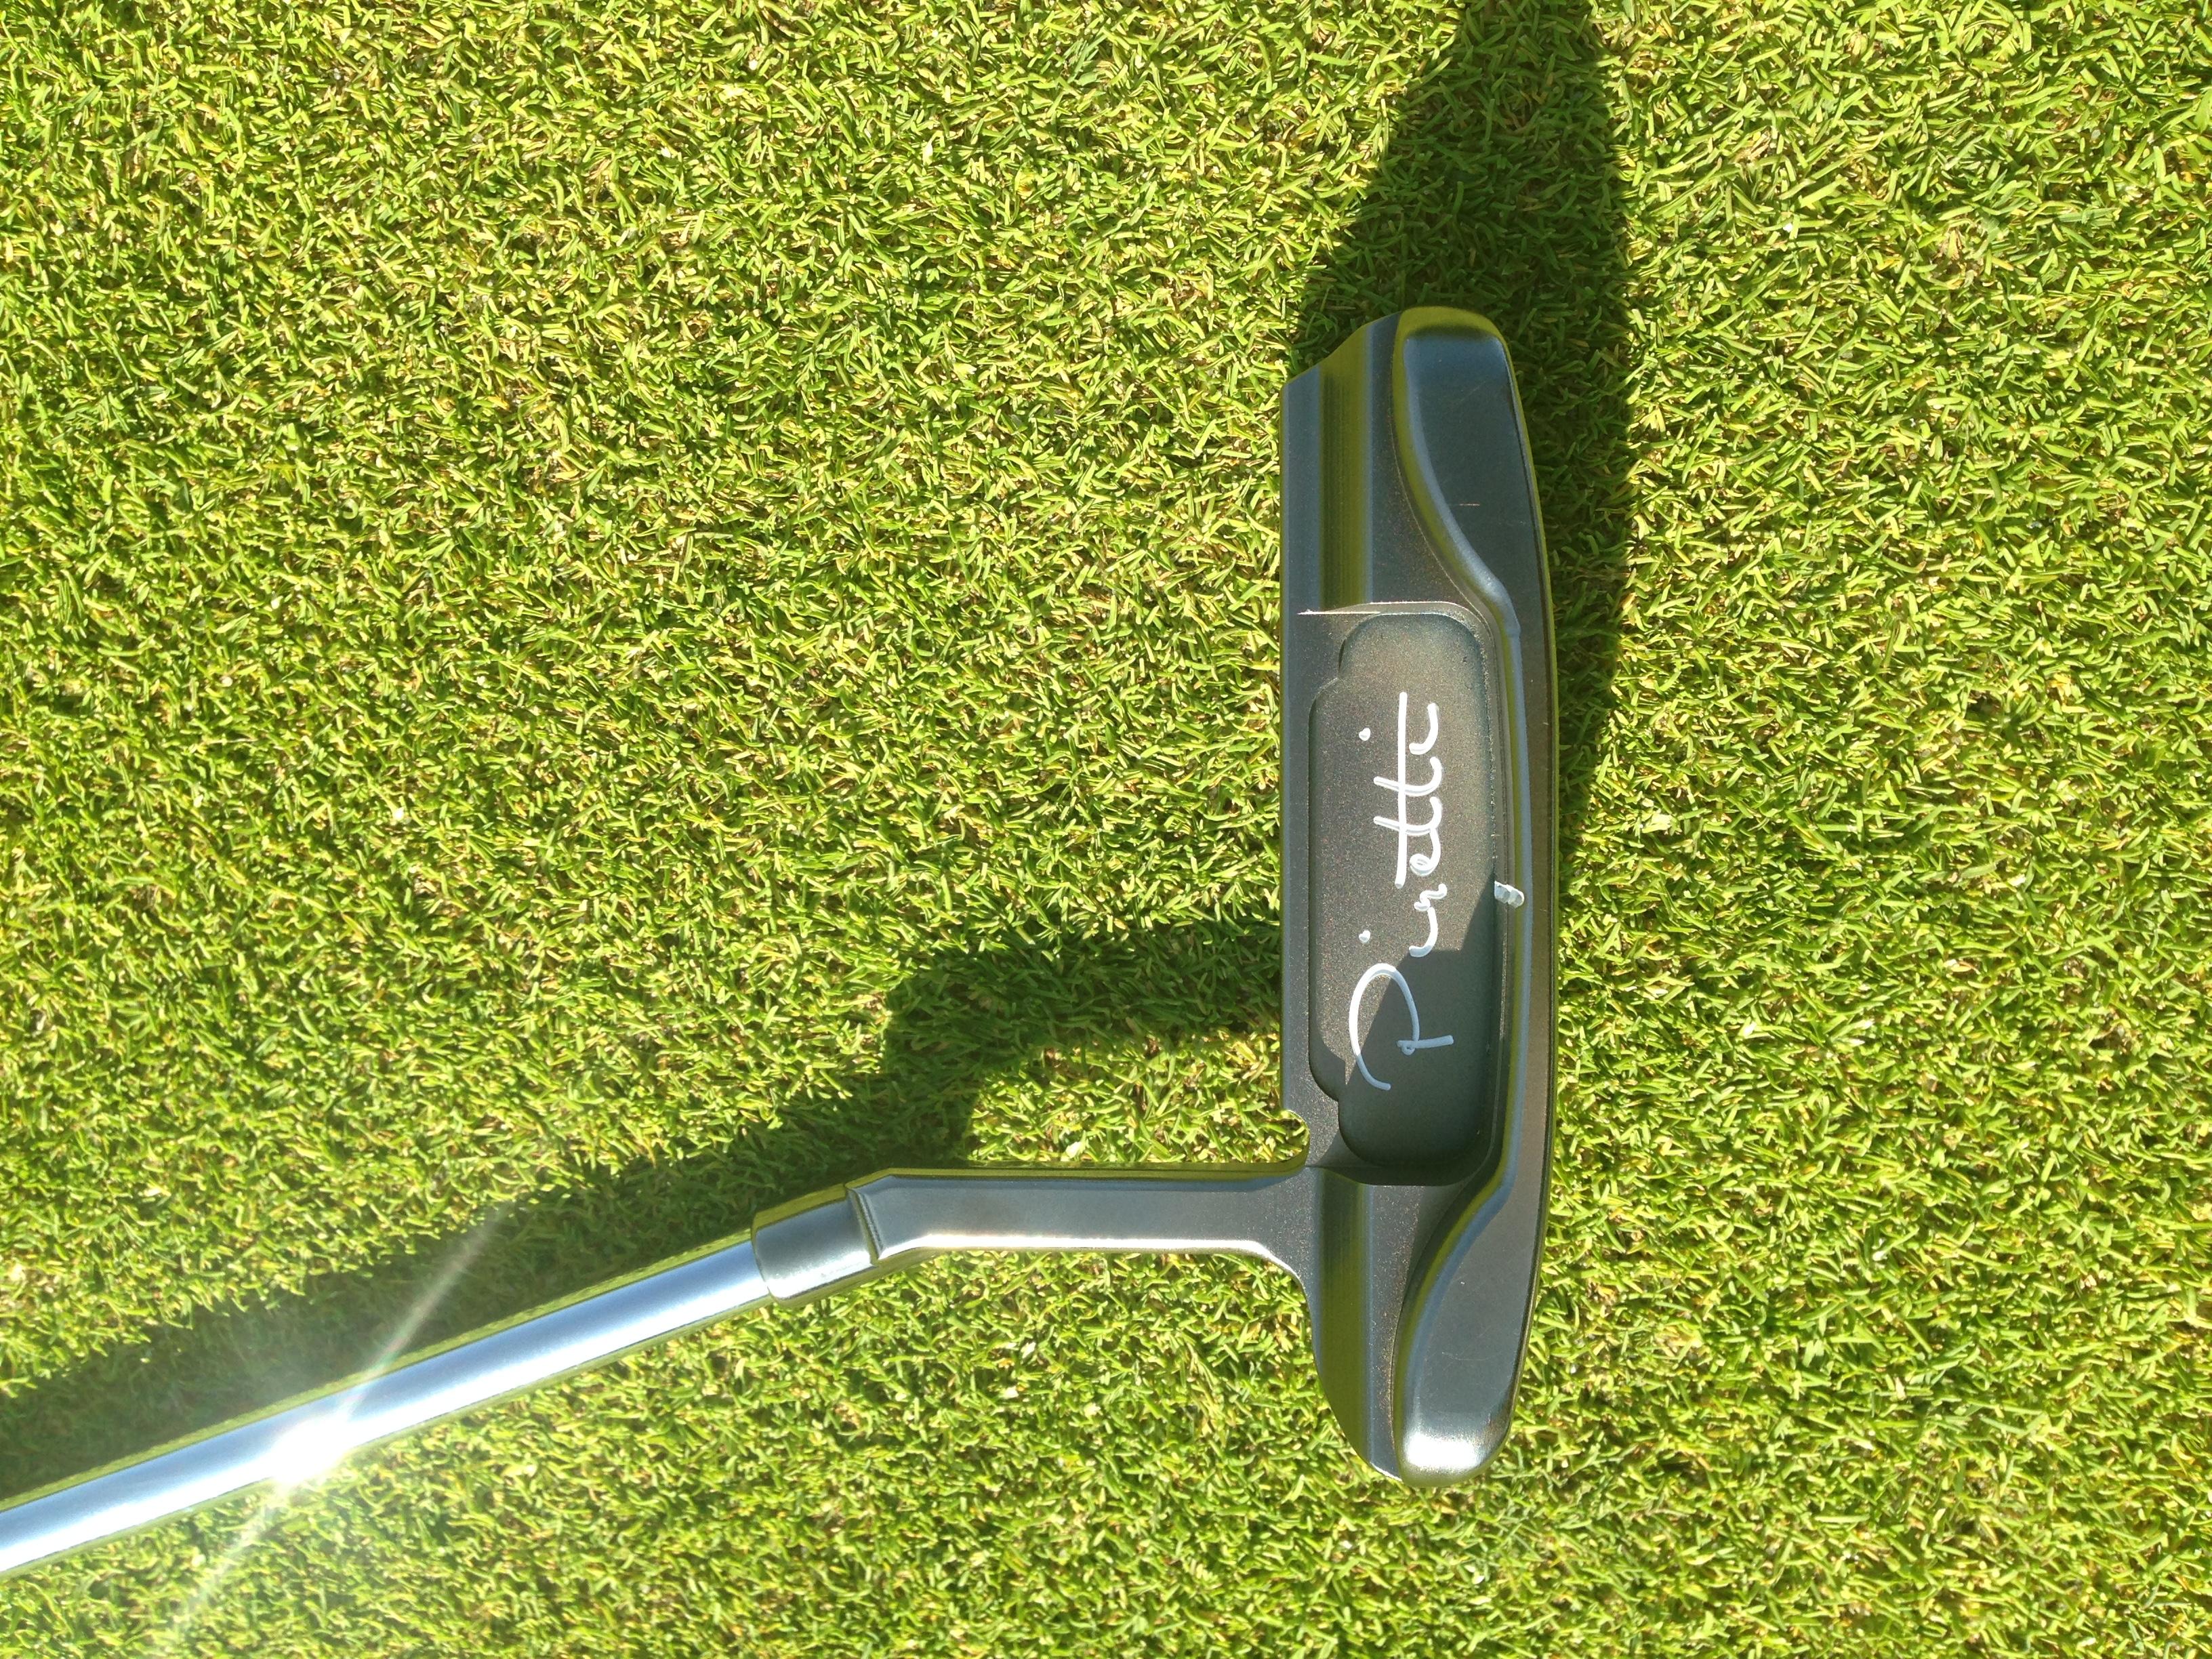 piretti putter review golf by josh hurts pga professional